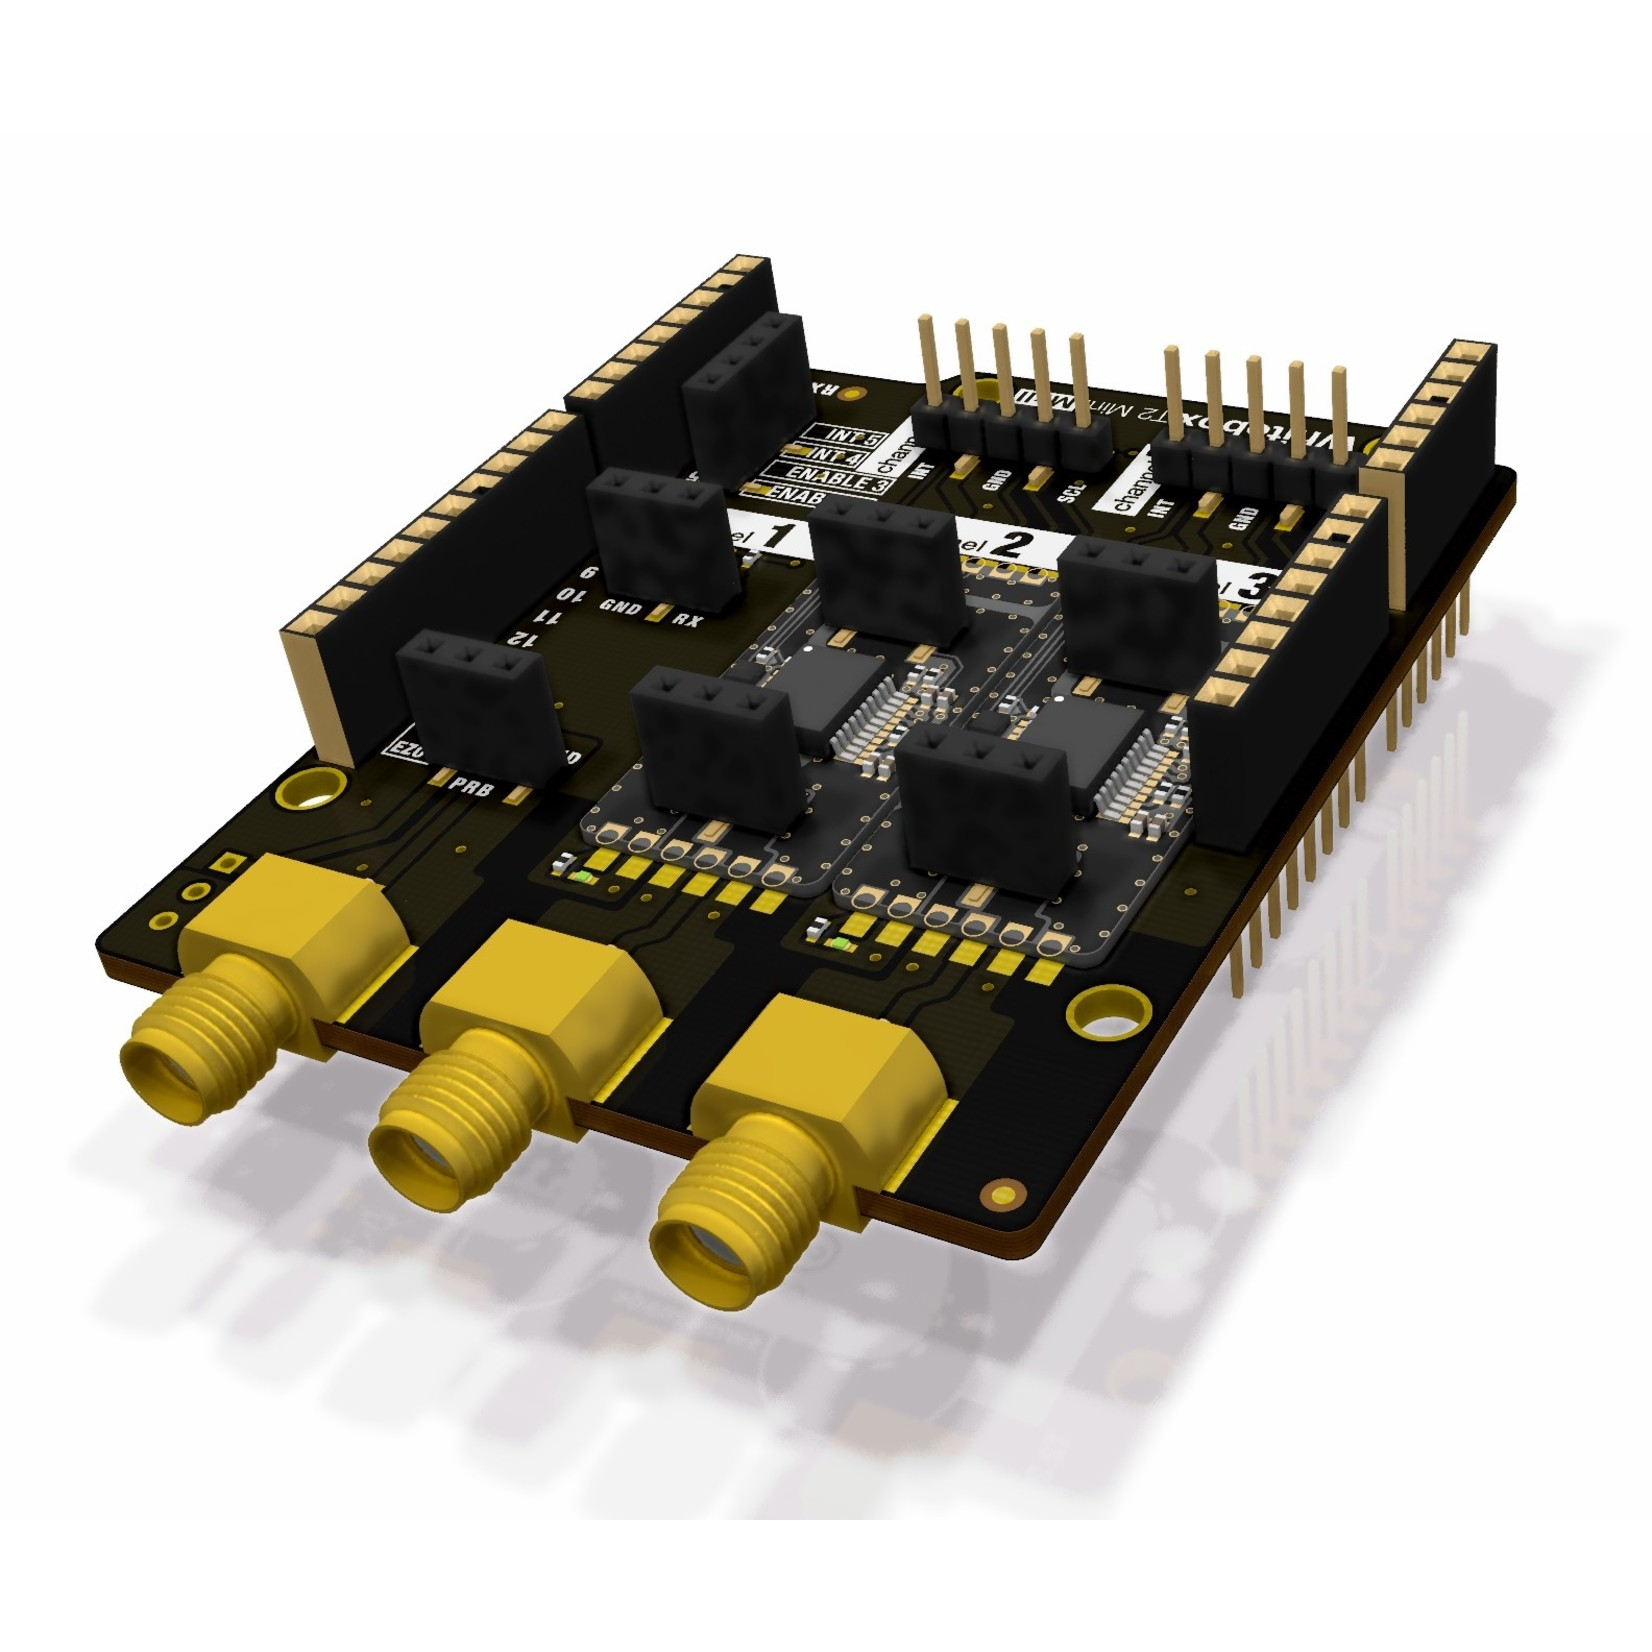 Whitebox Labs Whitebox T2 for Arduino